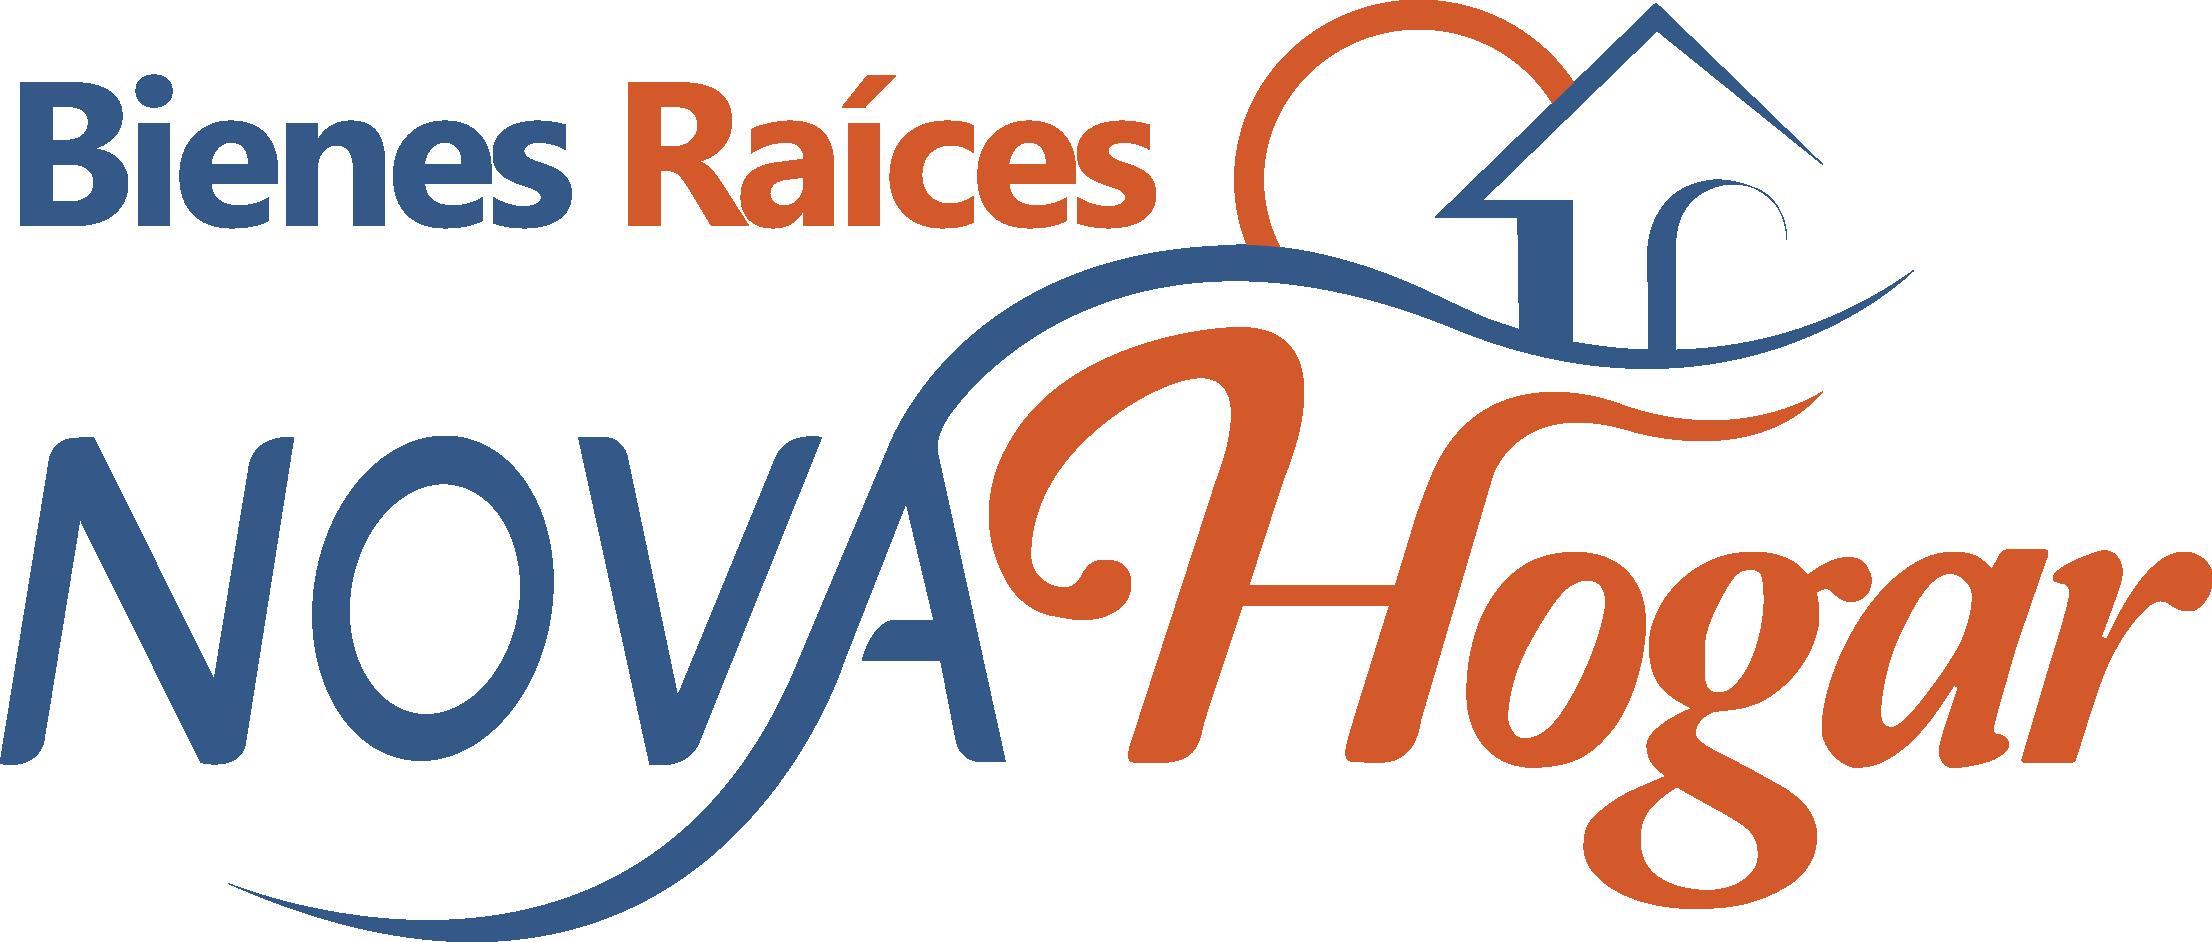 logotipo_NOVAHOGAR.png